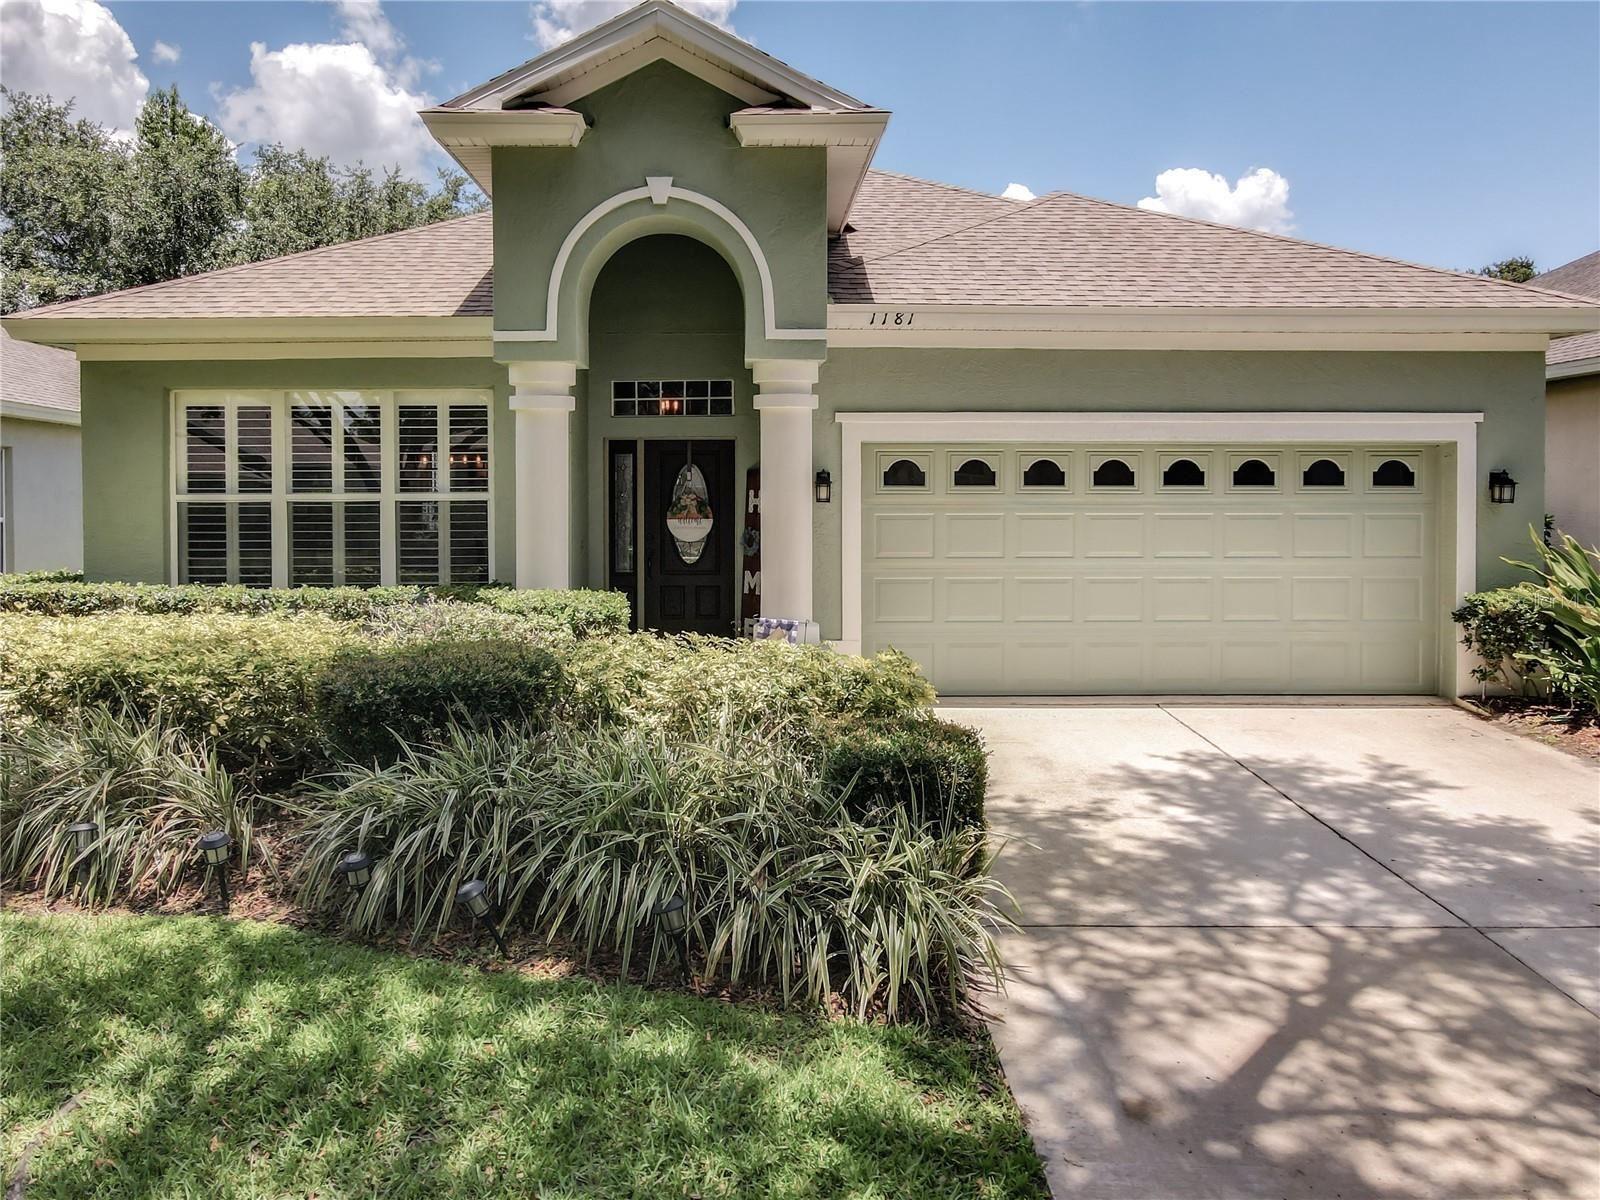 1181 CHESSINGTON CIRCLE, Lake Mary, FL 32746 - #: O5950500